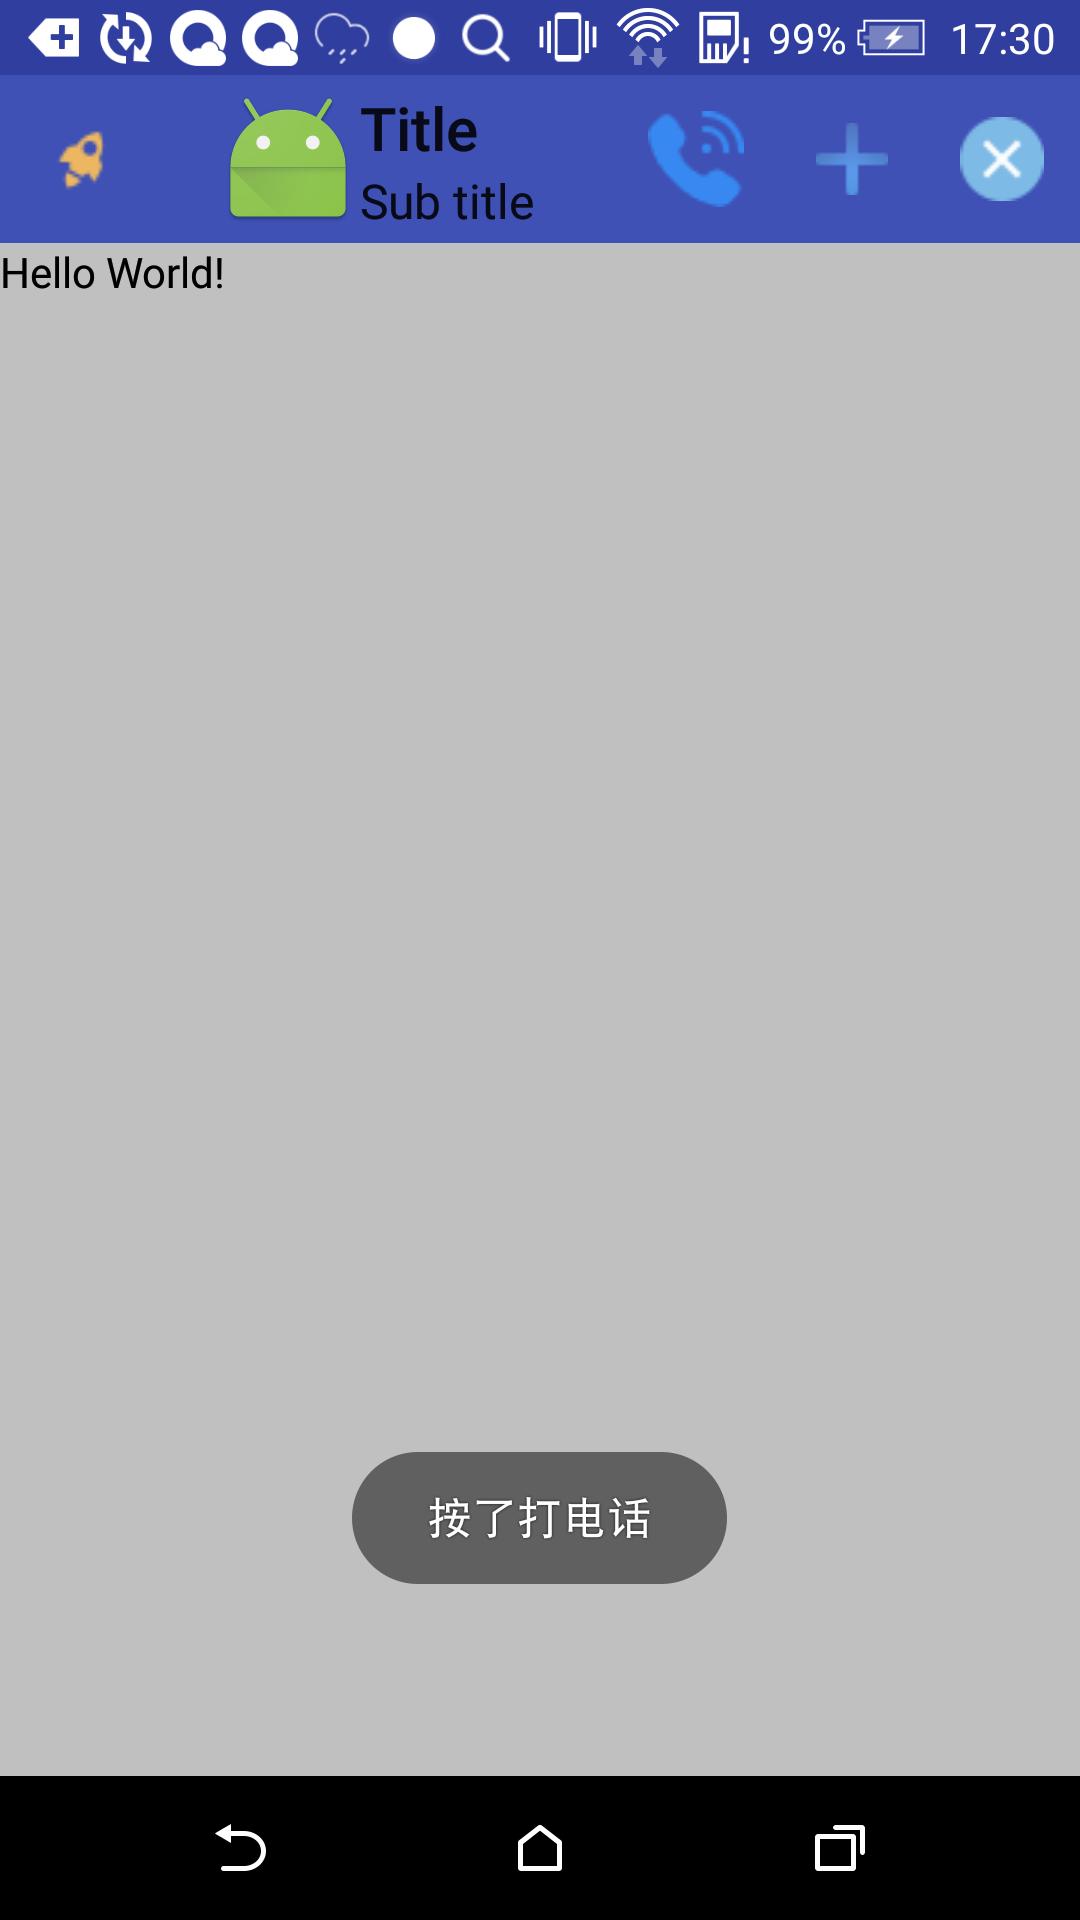 toolbar with menu